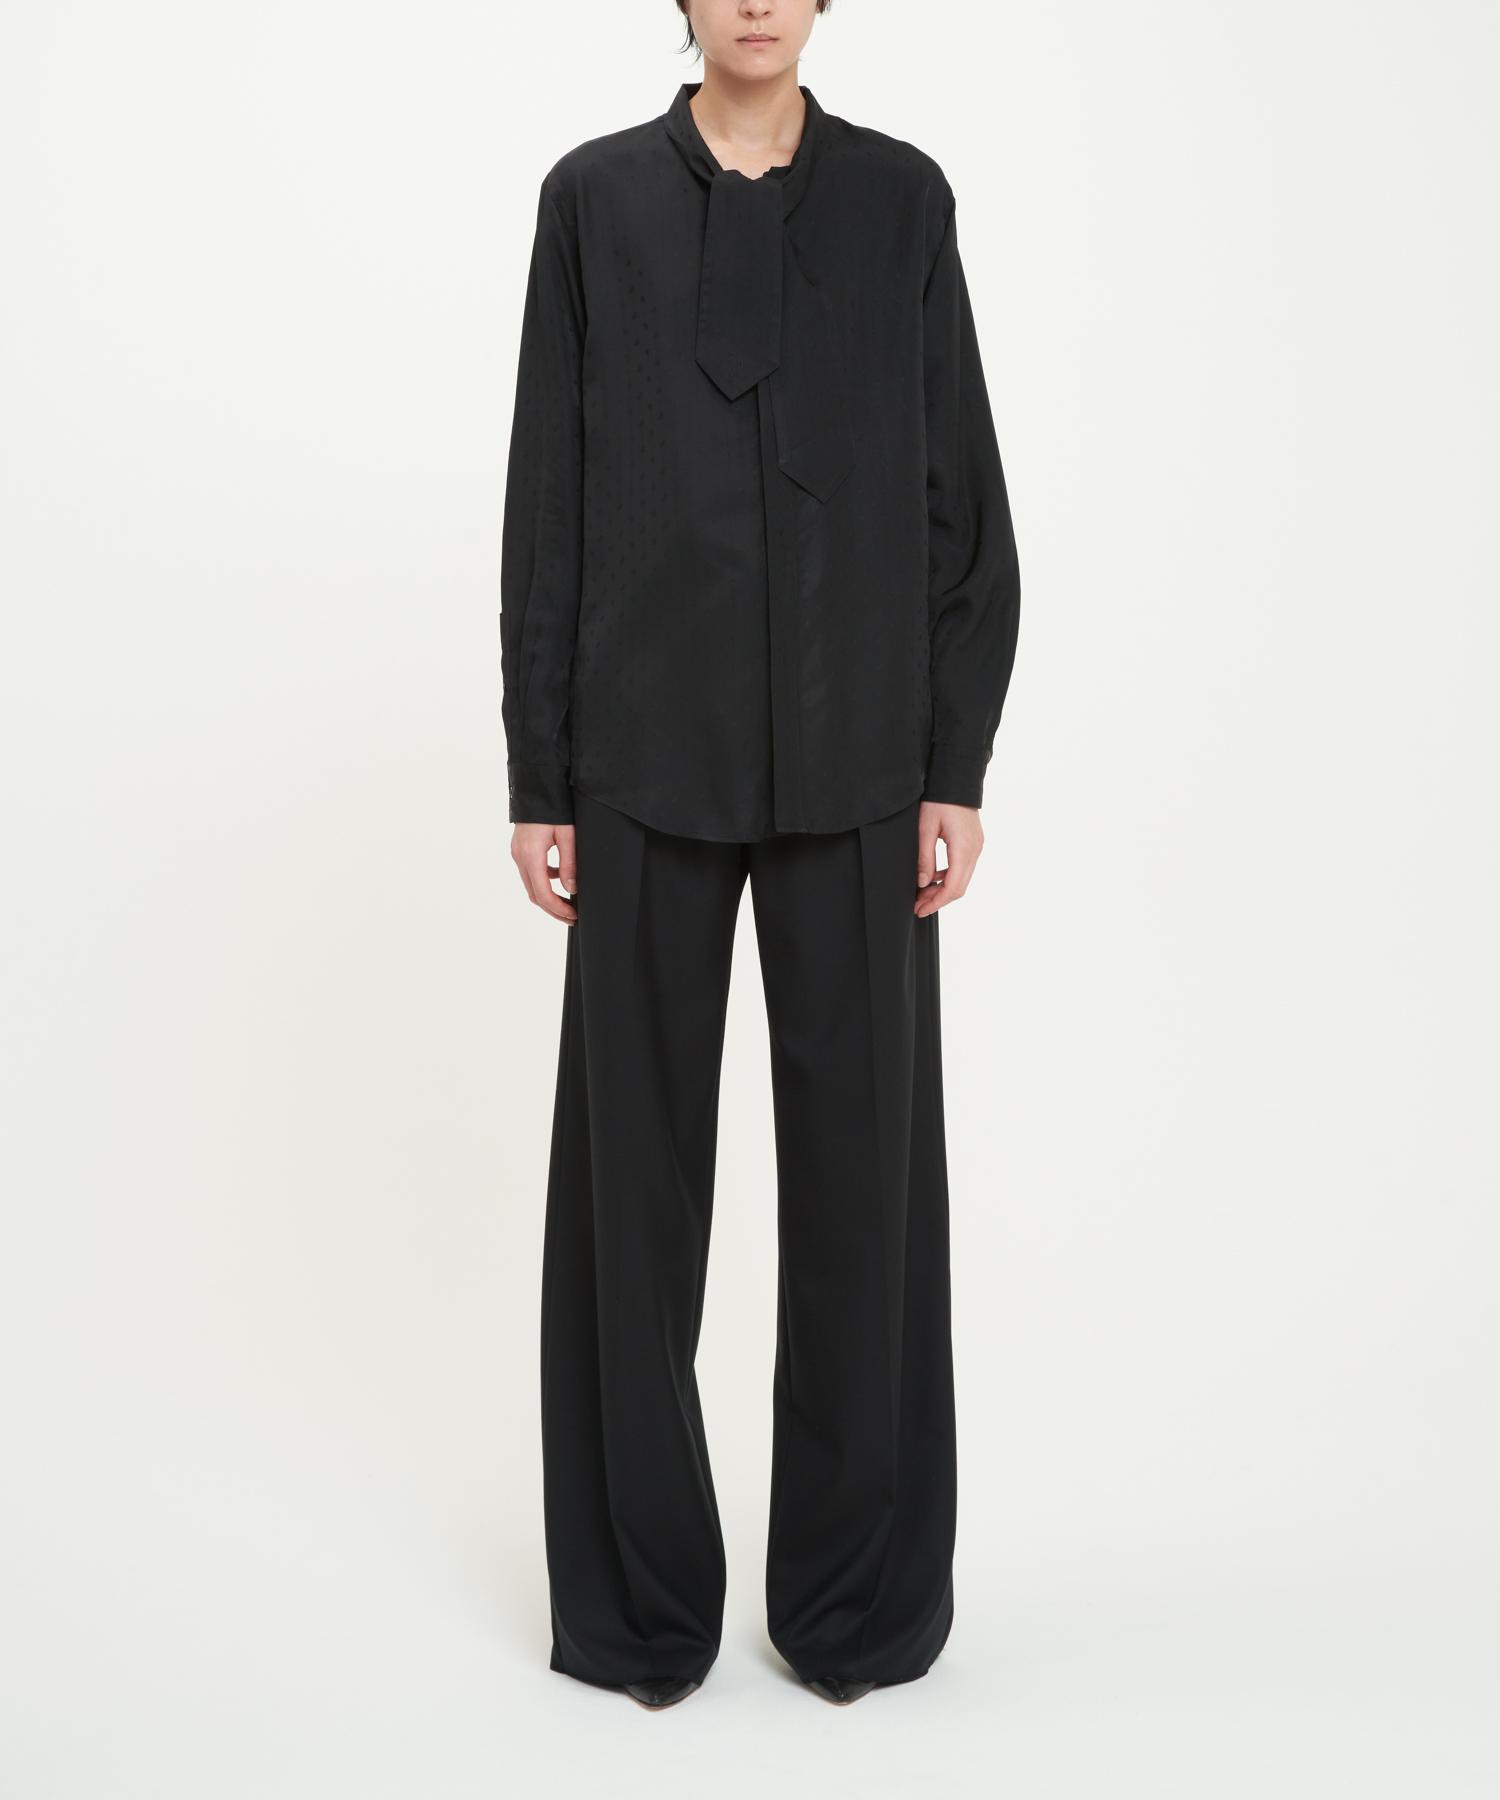 Black Cupro Paisley Lavalliere-Neck Shirt